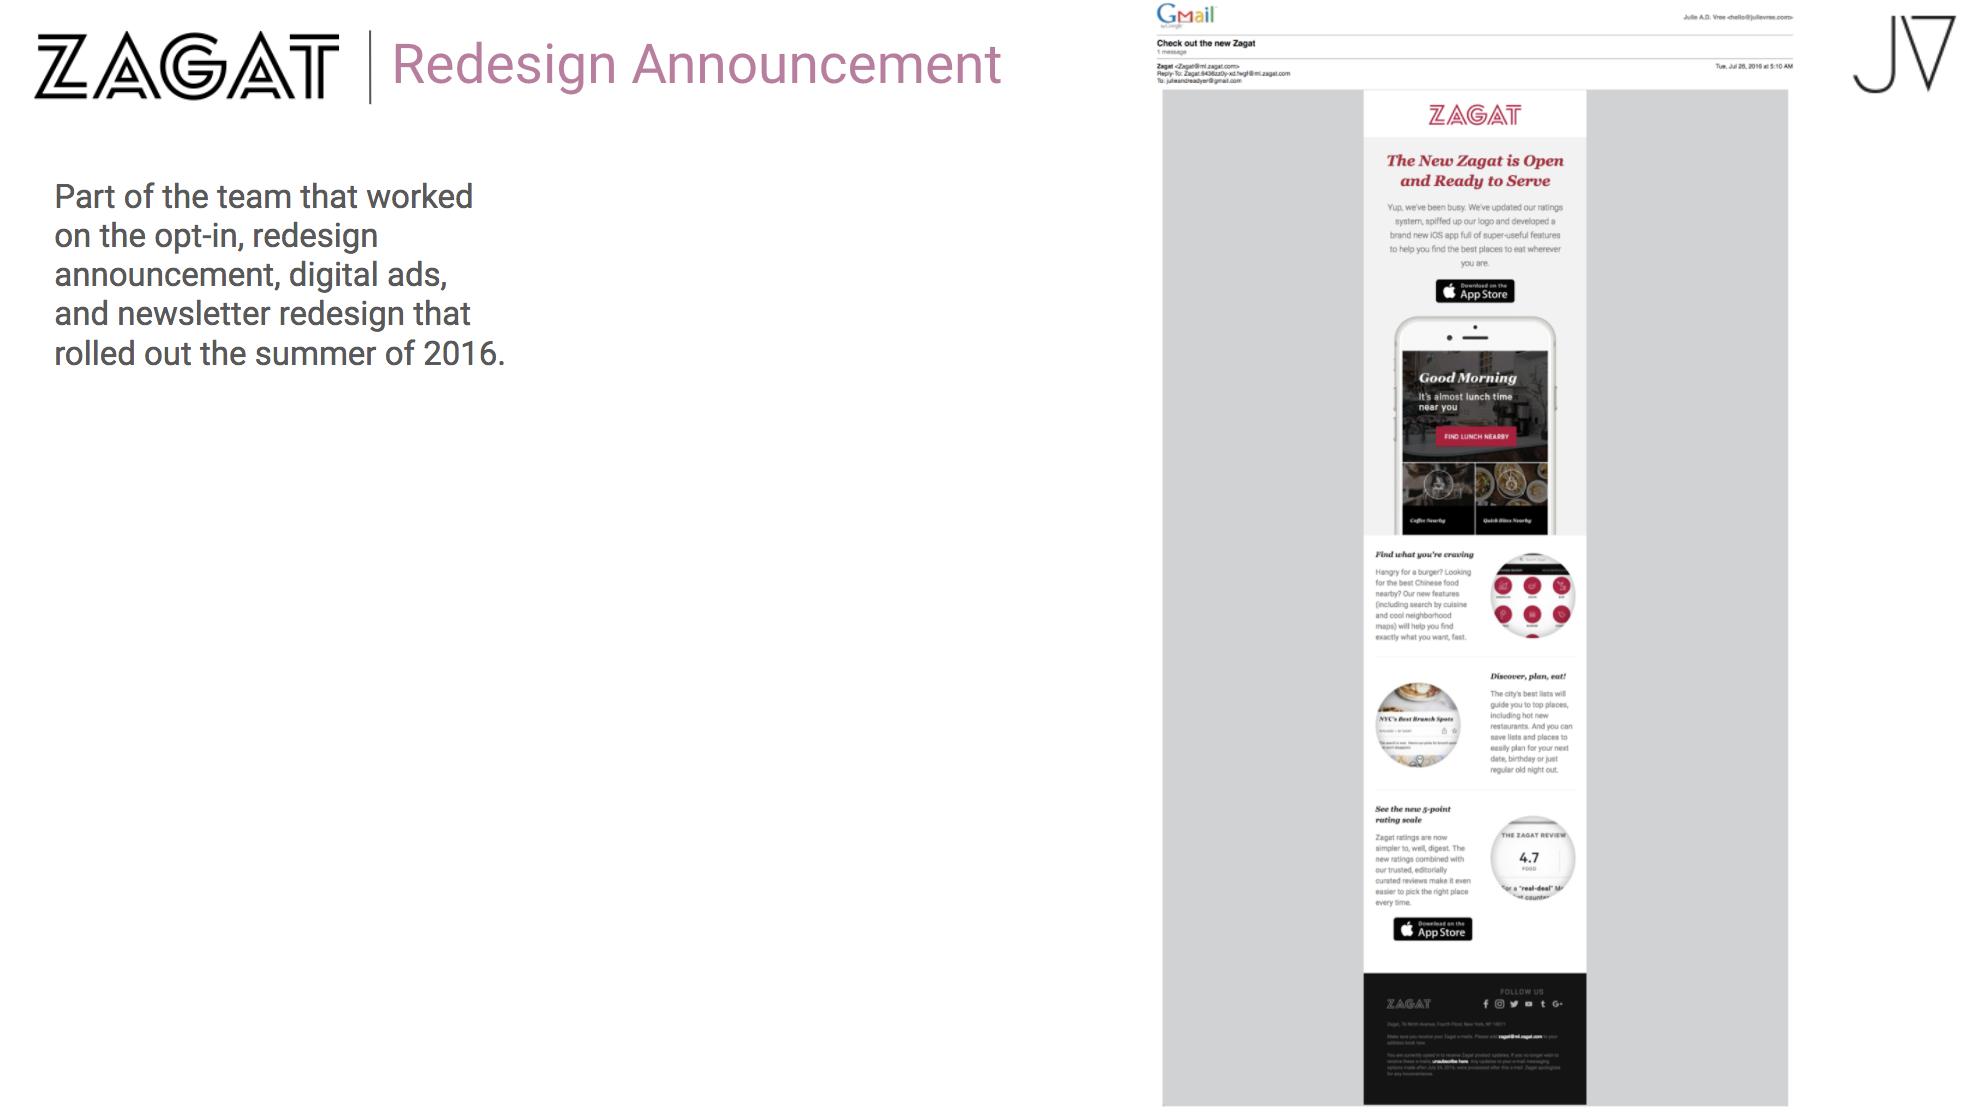 Zagat_Newsletter Redesign_Epsilon_updated.png